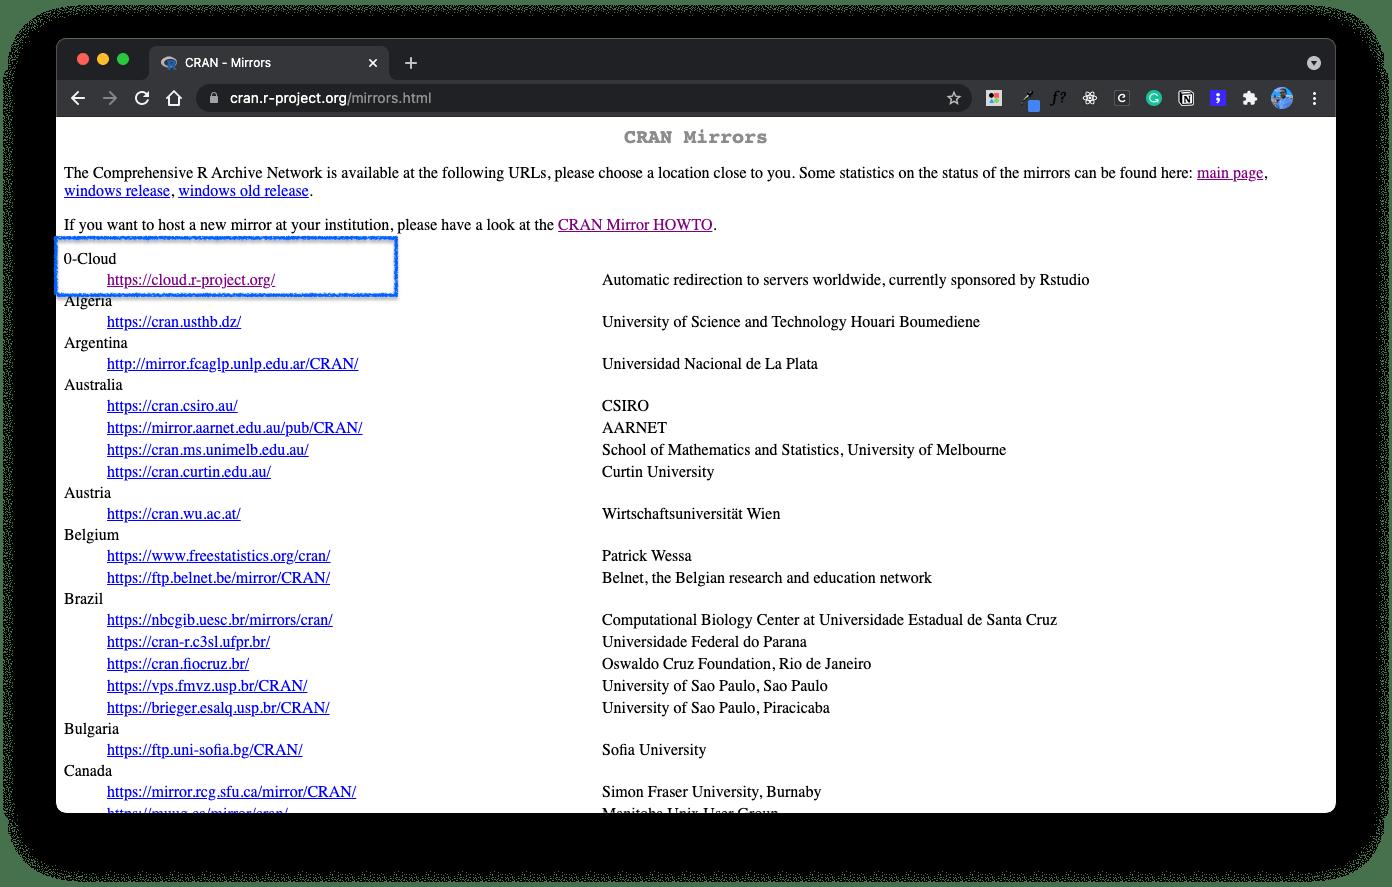 A screenshot of the CRAN mirrors page